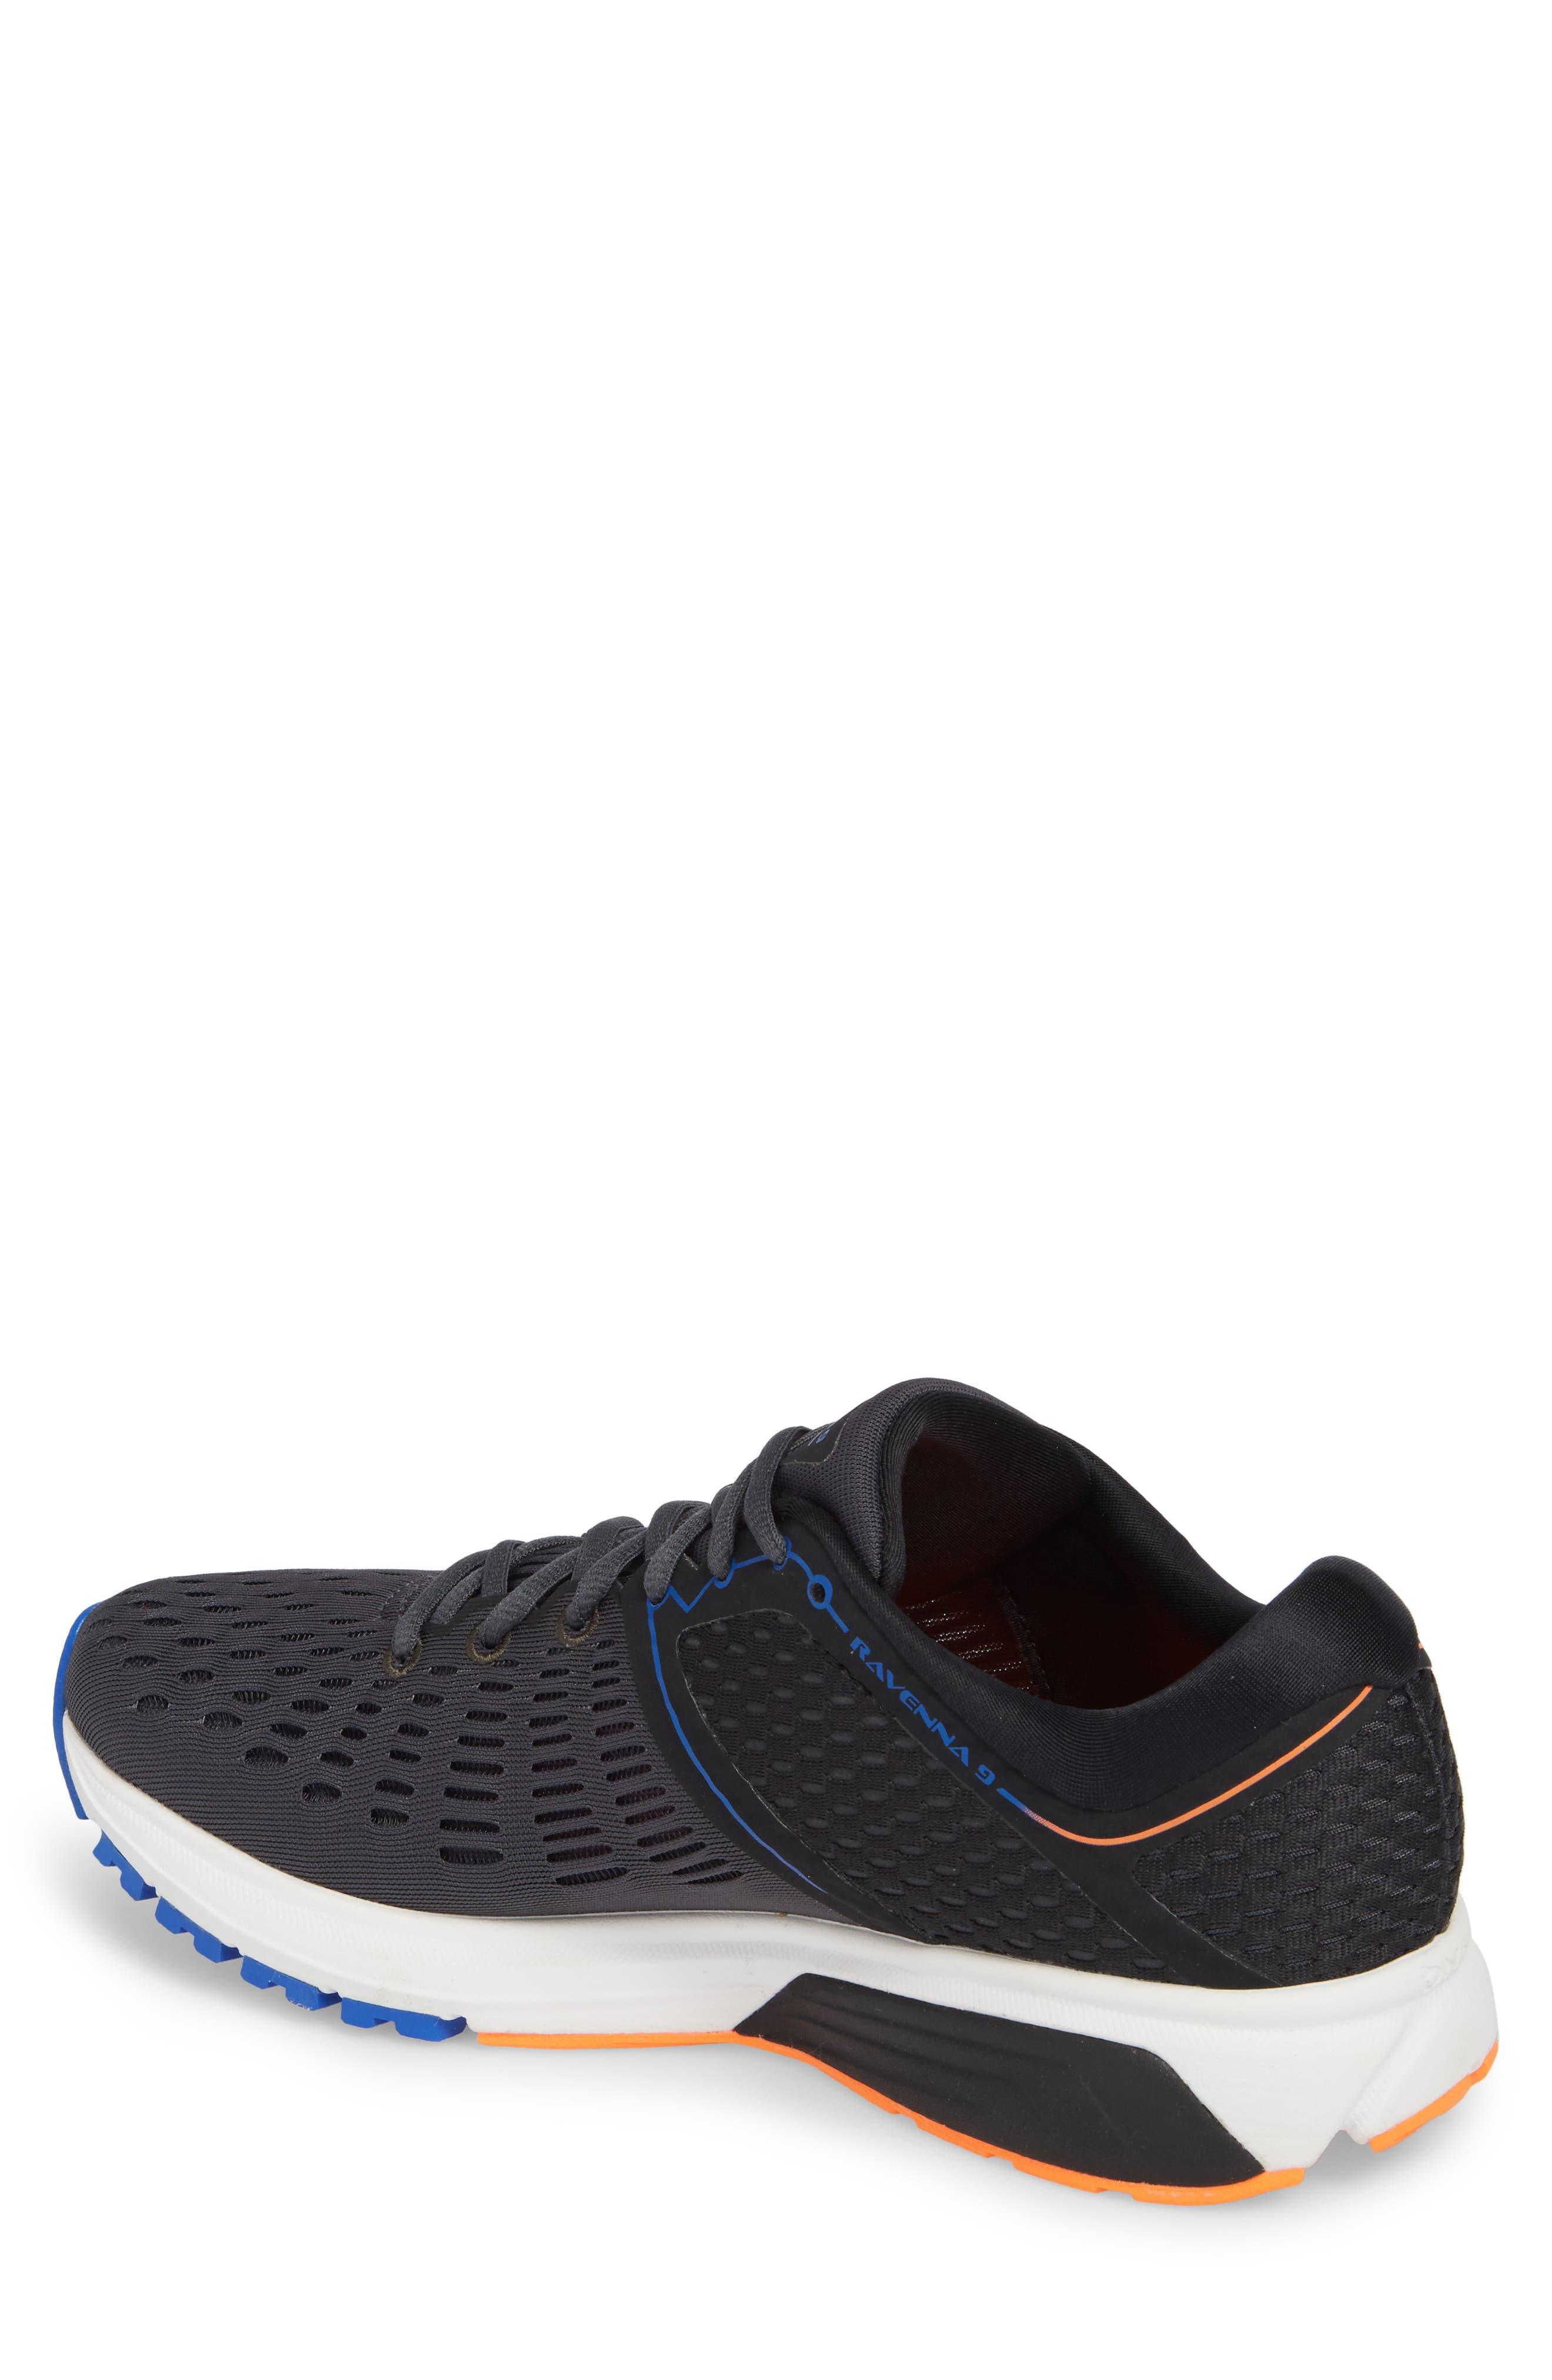 Ravenna 9 Running Shoe,                             Alternate thumbnail 2, color,                             EBONY/ BLUE/ ORANGE